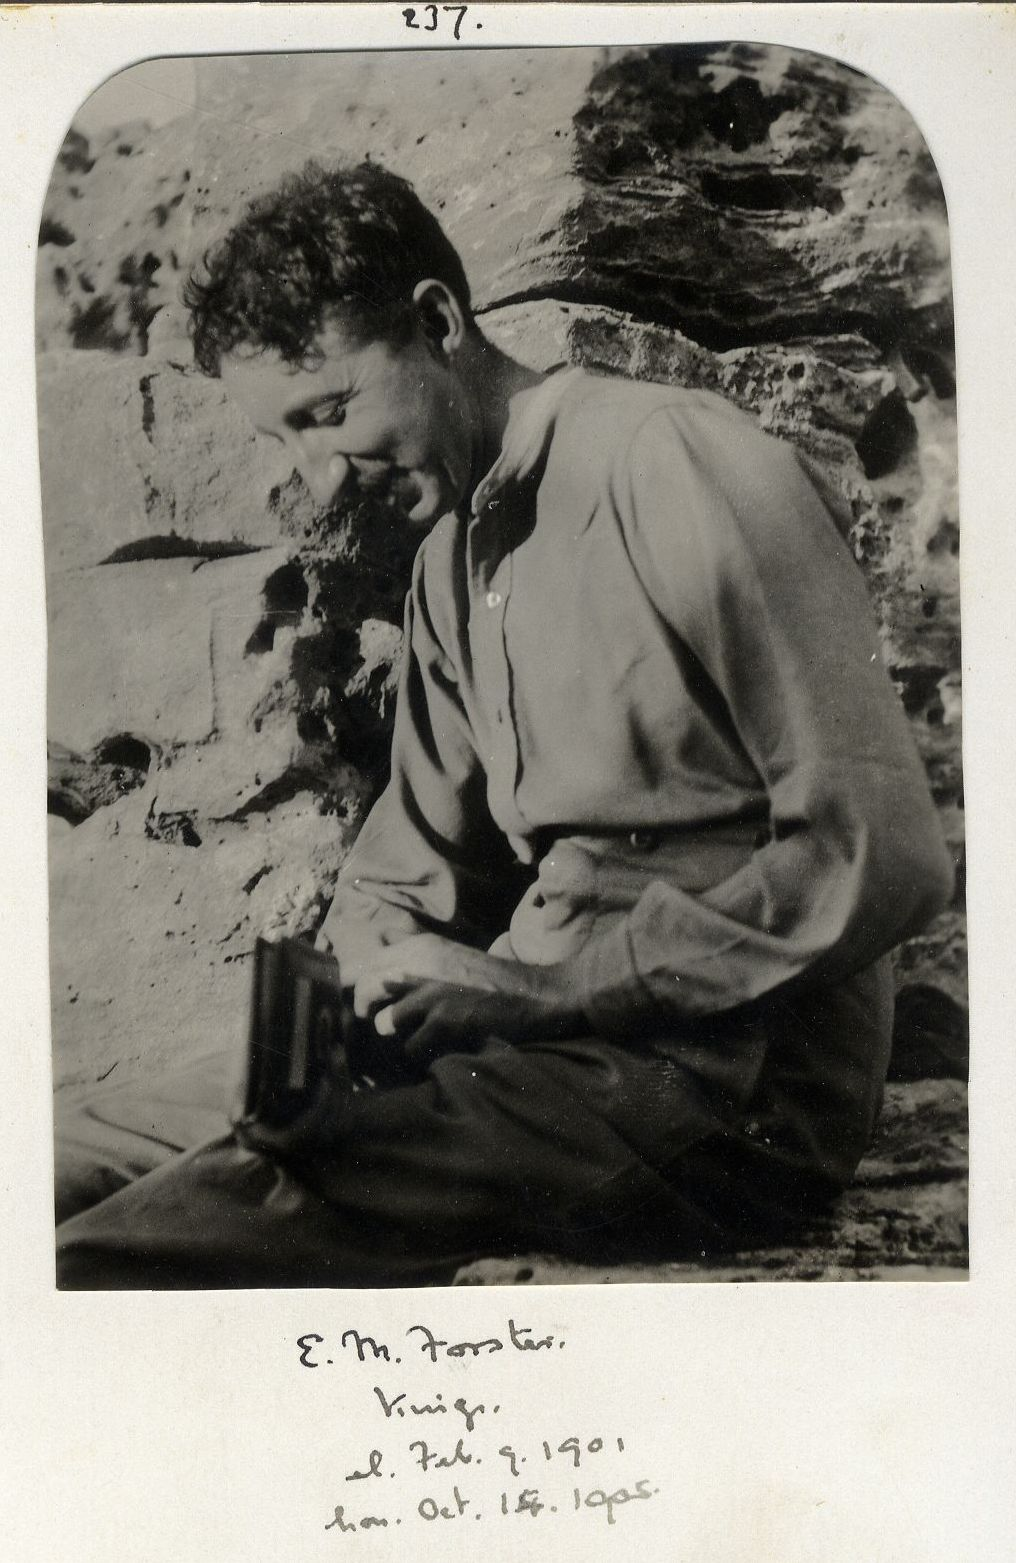 237: Forster, Edward Morgan. [KCAS/39/4/1, Photobook, p.72]